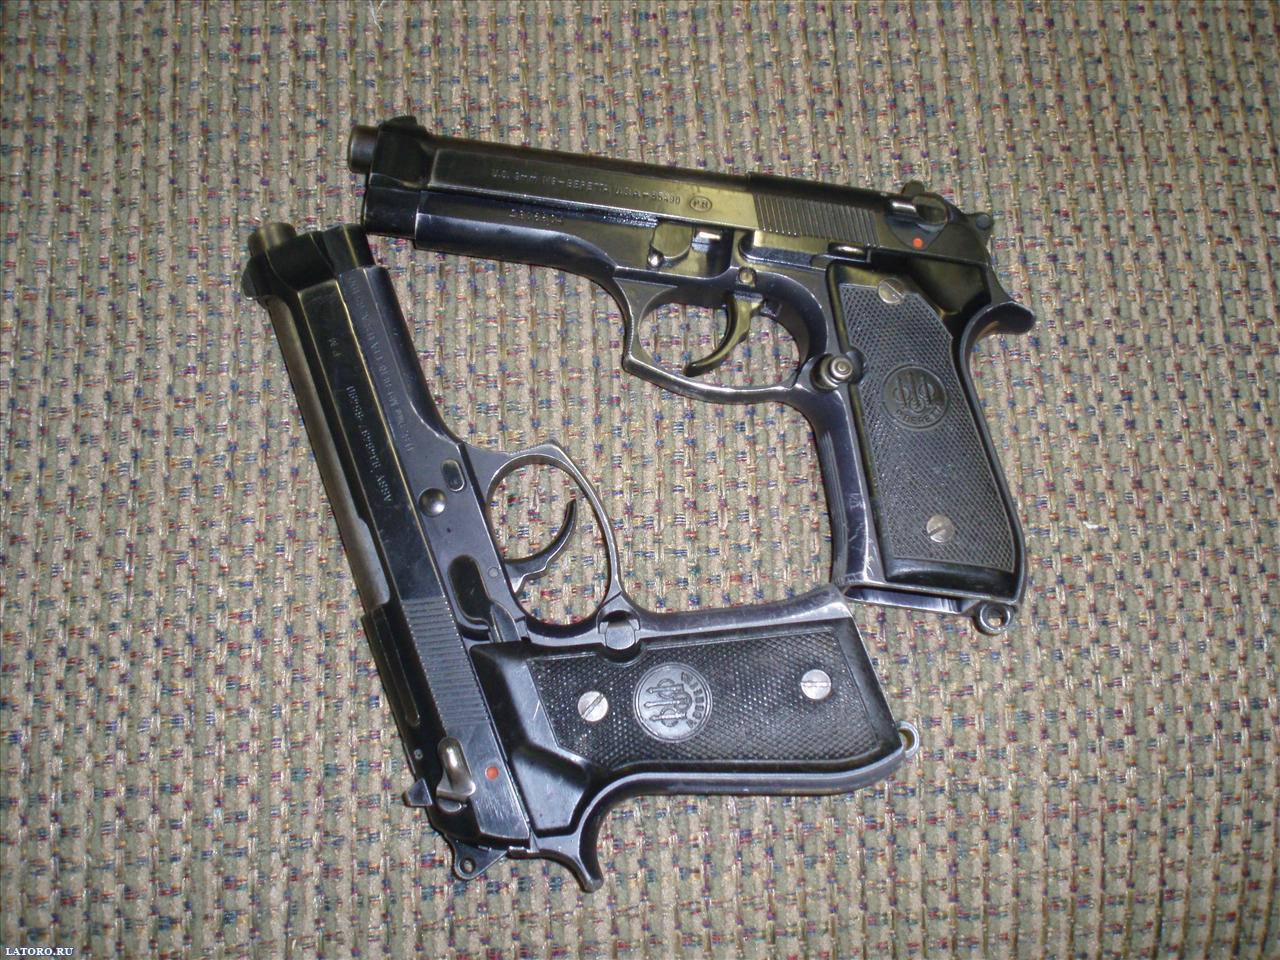 http://3.bp.blogspot.com/_LG5oyPV40eE/TUQVMQuSsxI/AAAAAAAAAFs/4_rMX29OT_U/s1600/16246-desktop-wallpapers-beretta-gun.jpg